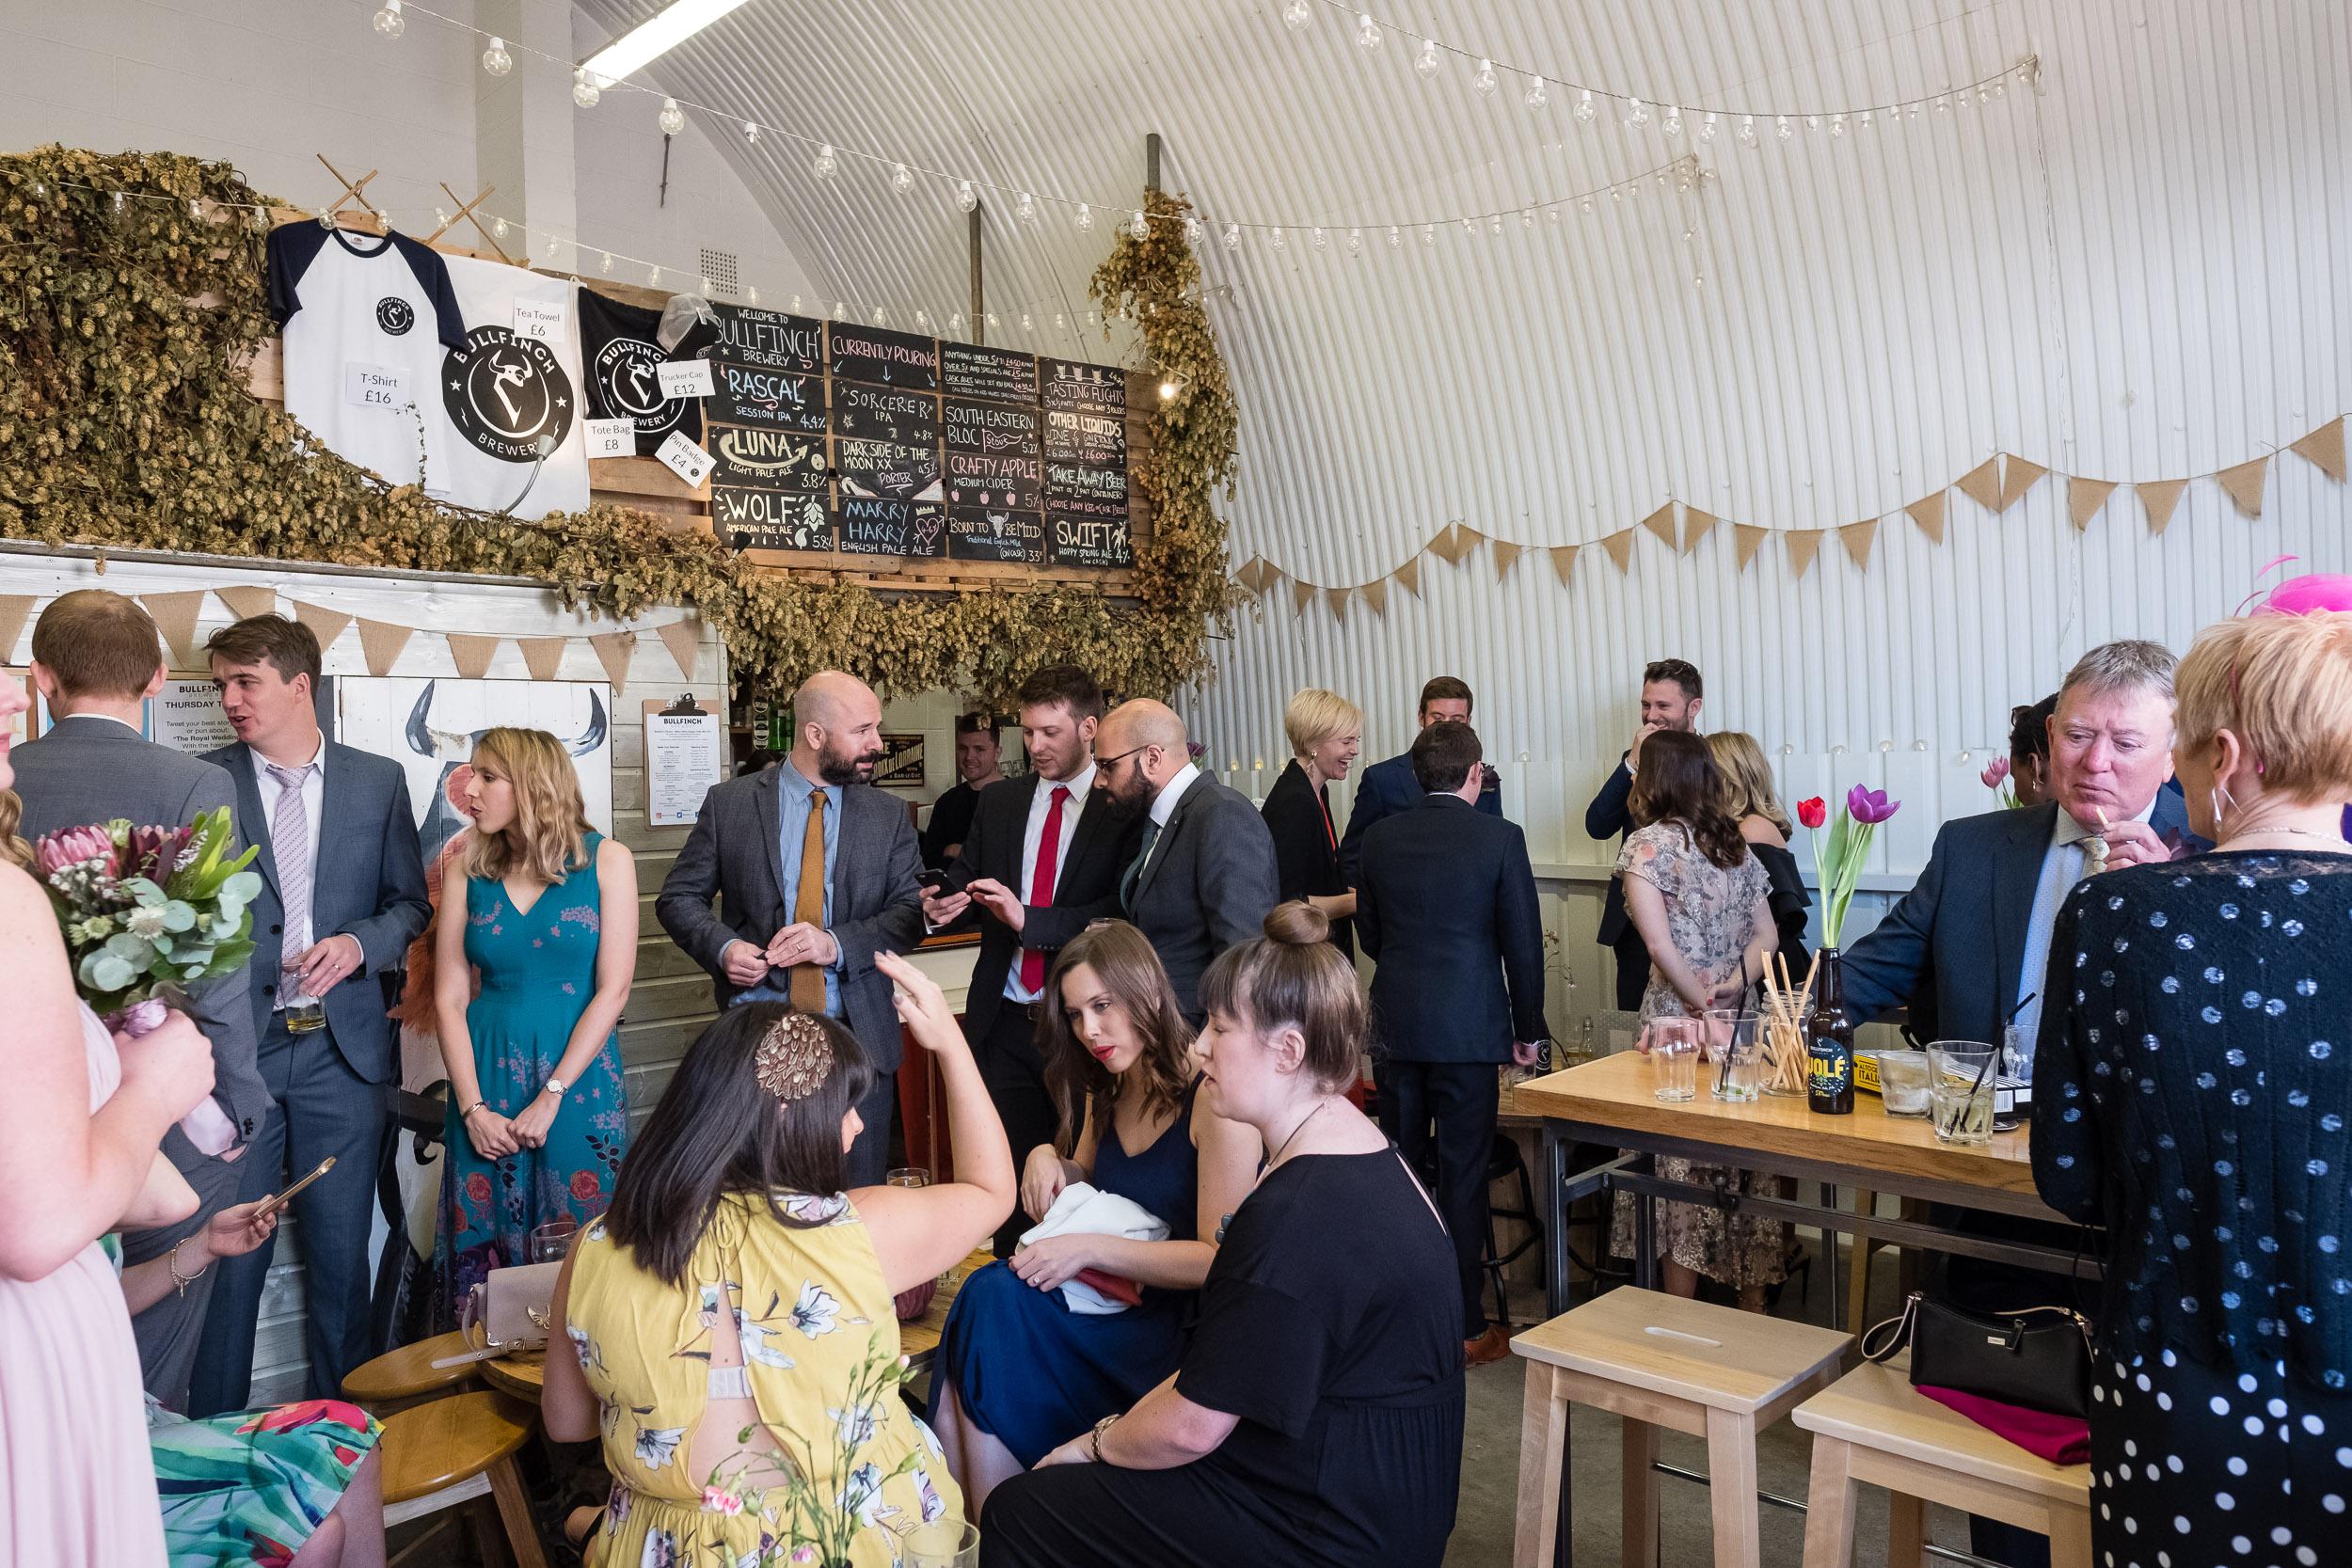 brockwell-lido-brixton-herne-hill-wedding-087.jpg